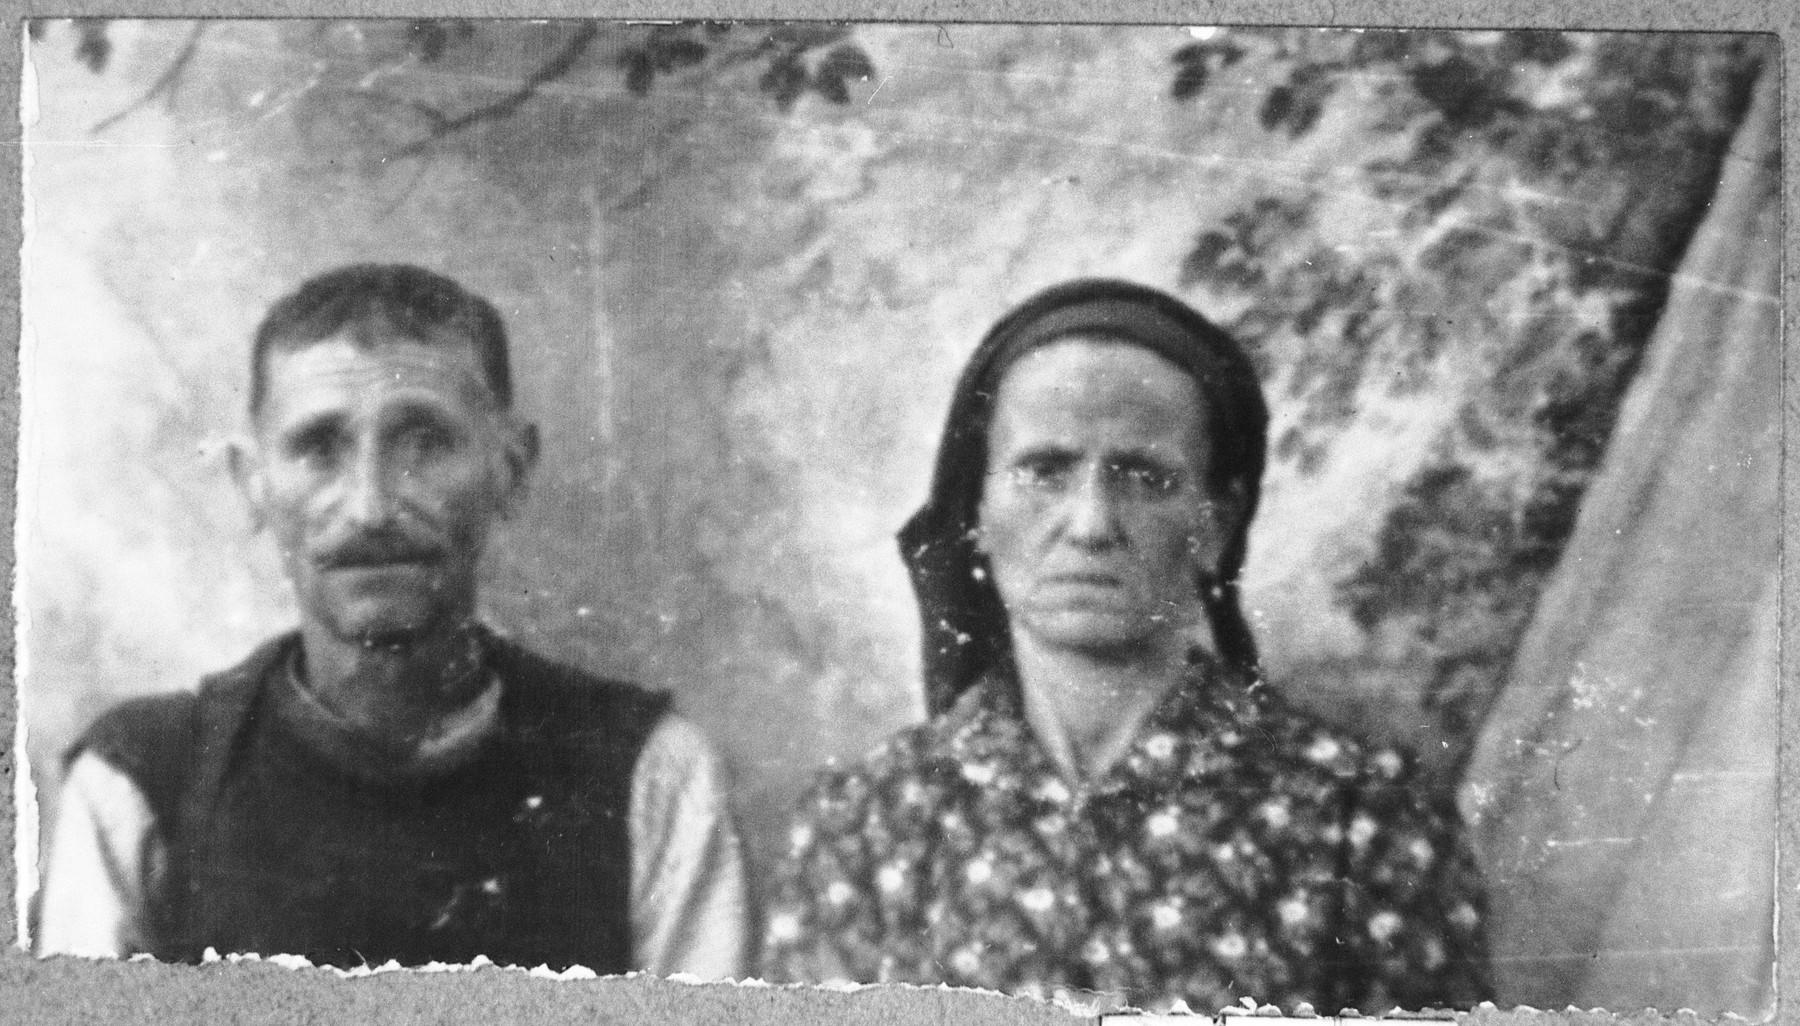 Portrait of Eliau Koen and his wife, Gracia.  Eliau was a coachman.  They lived at Avliya 4 in Bitola.